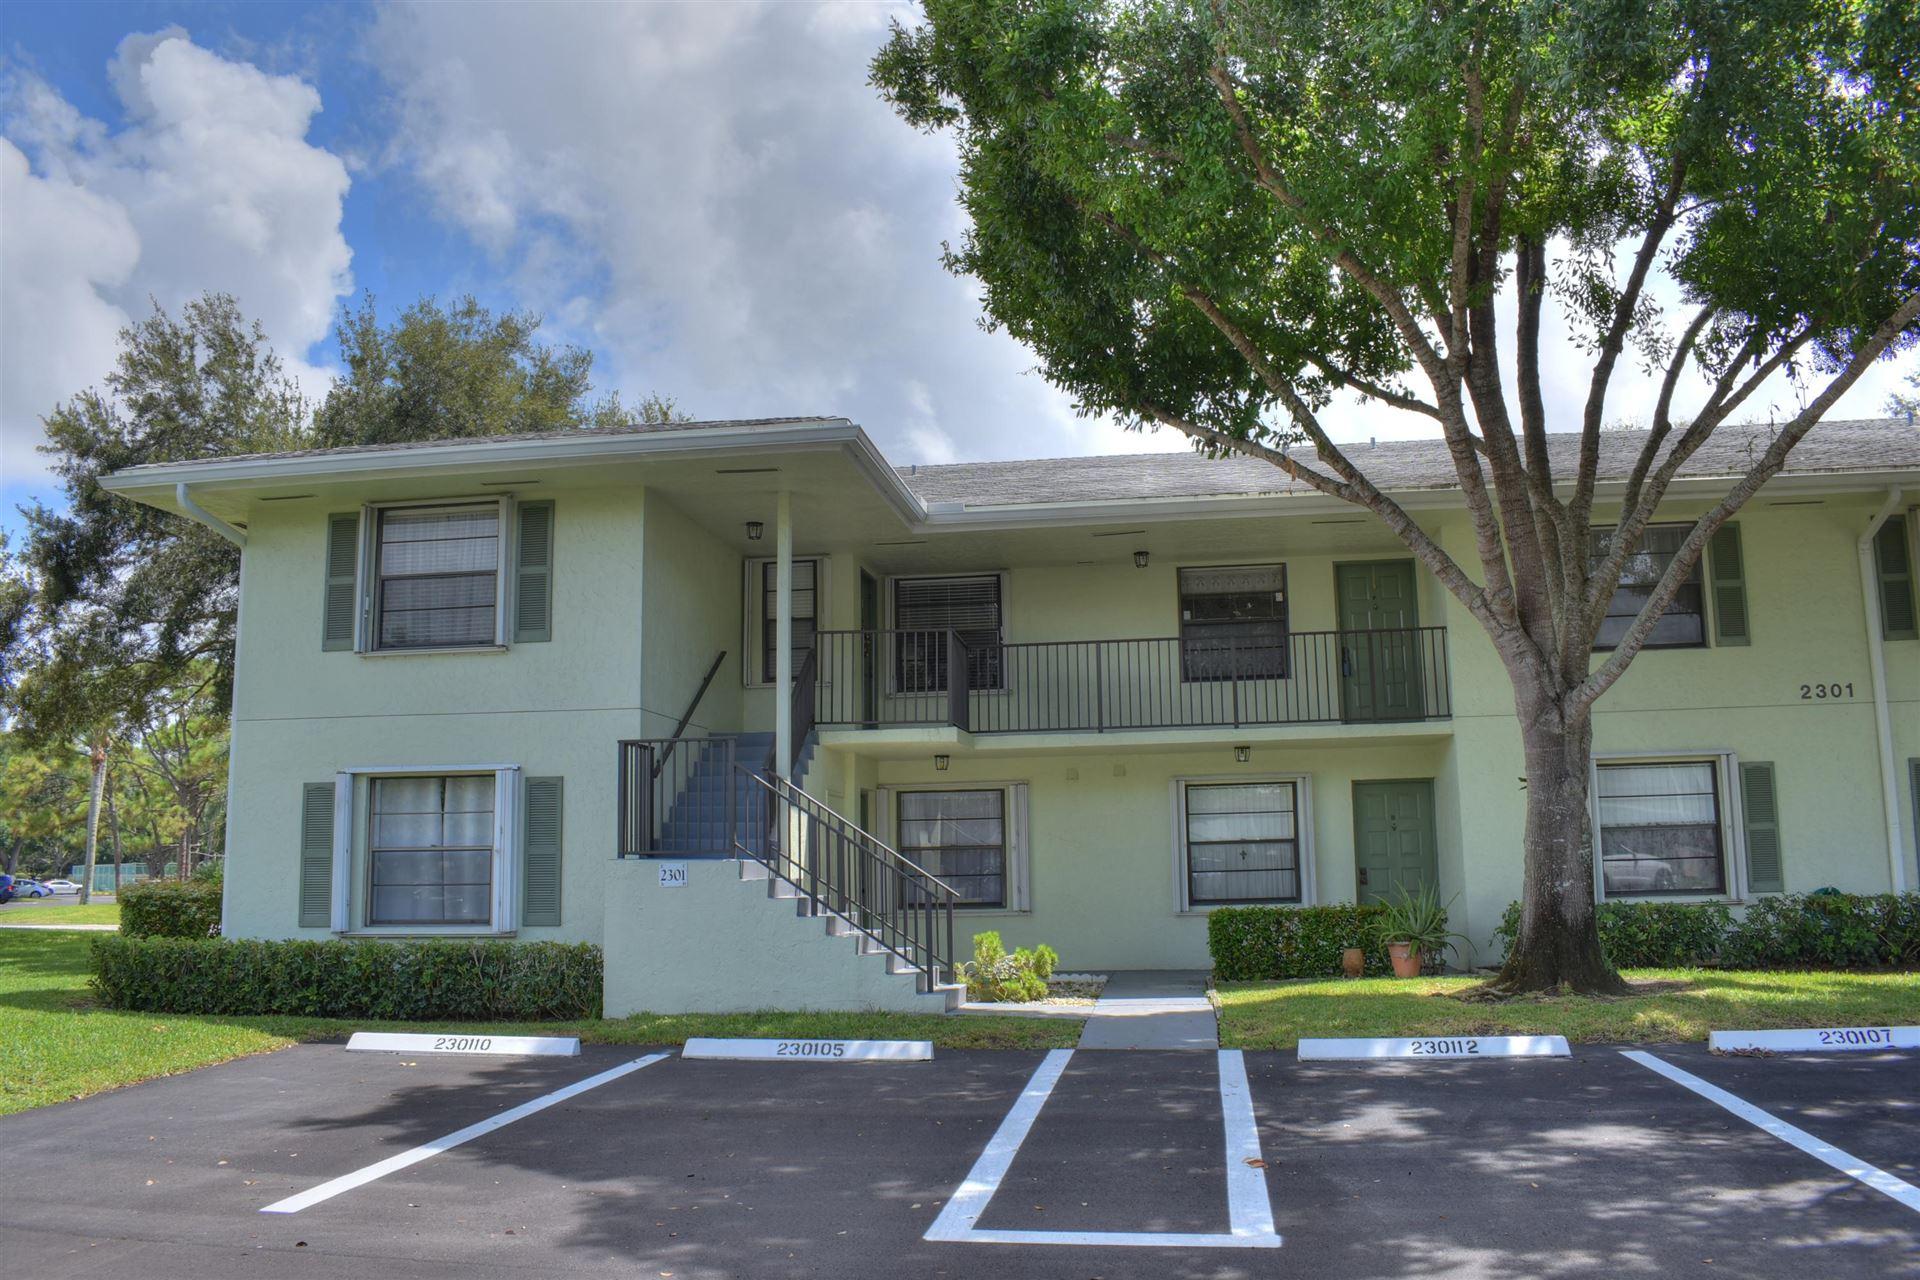 2301 Sabal Ridge Court #F, Palm Beach Gardens, FL 33418 - #: RX-10641462